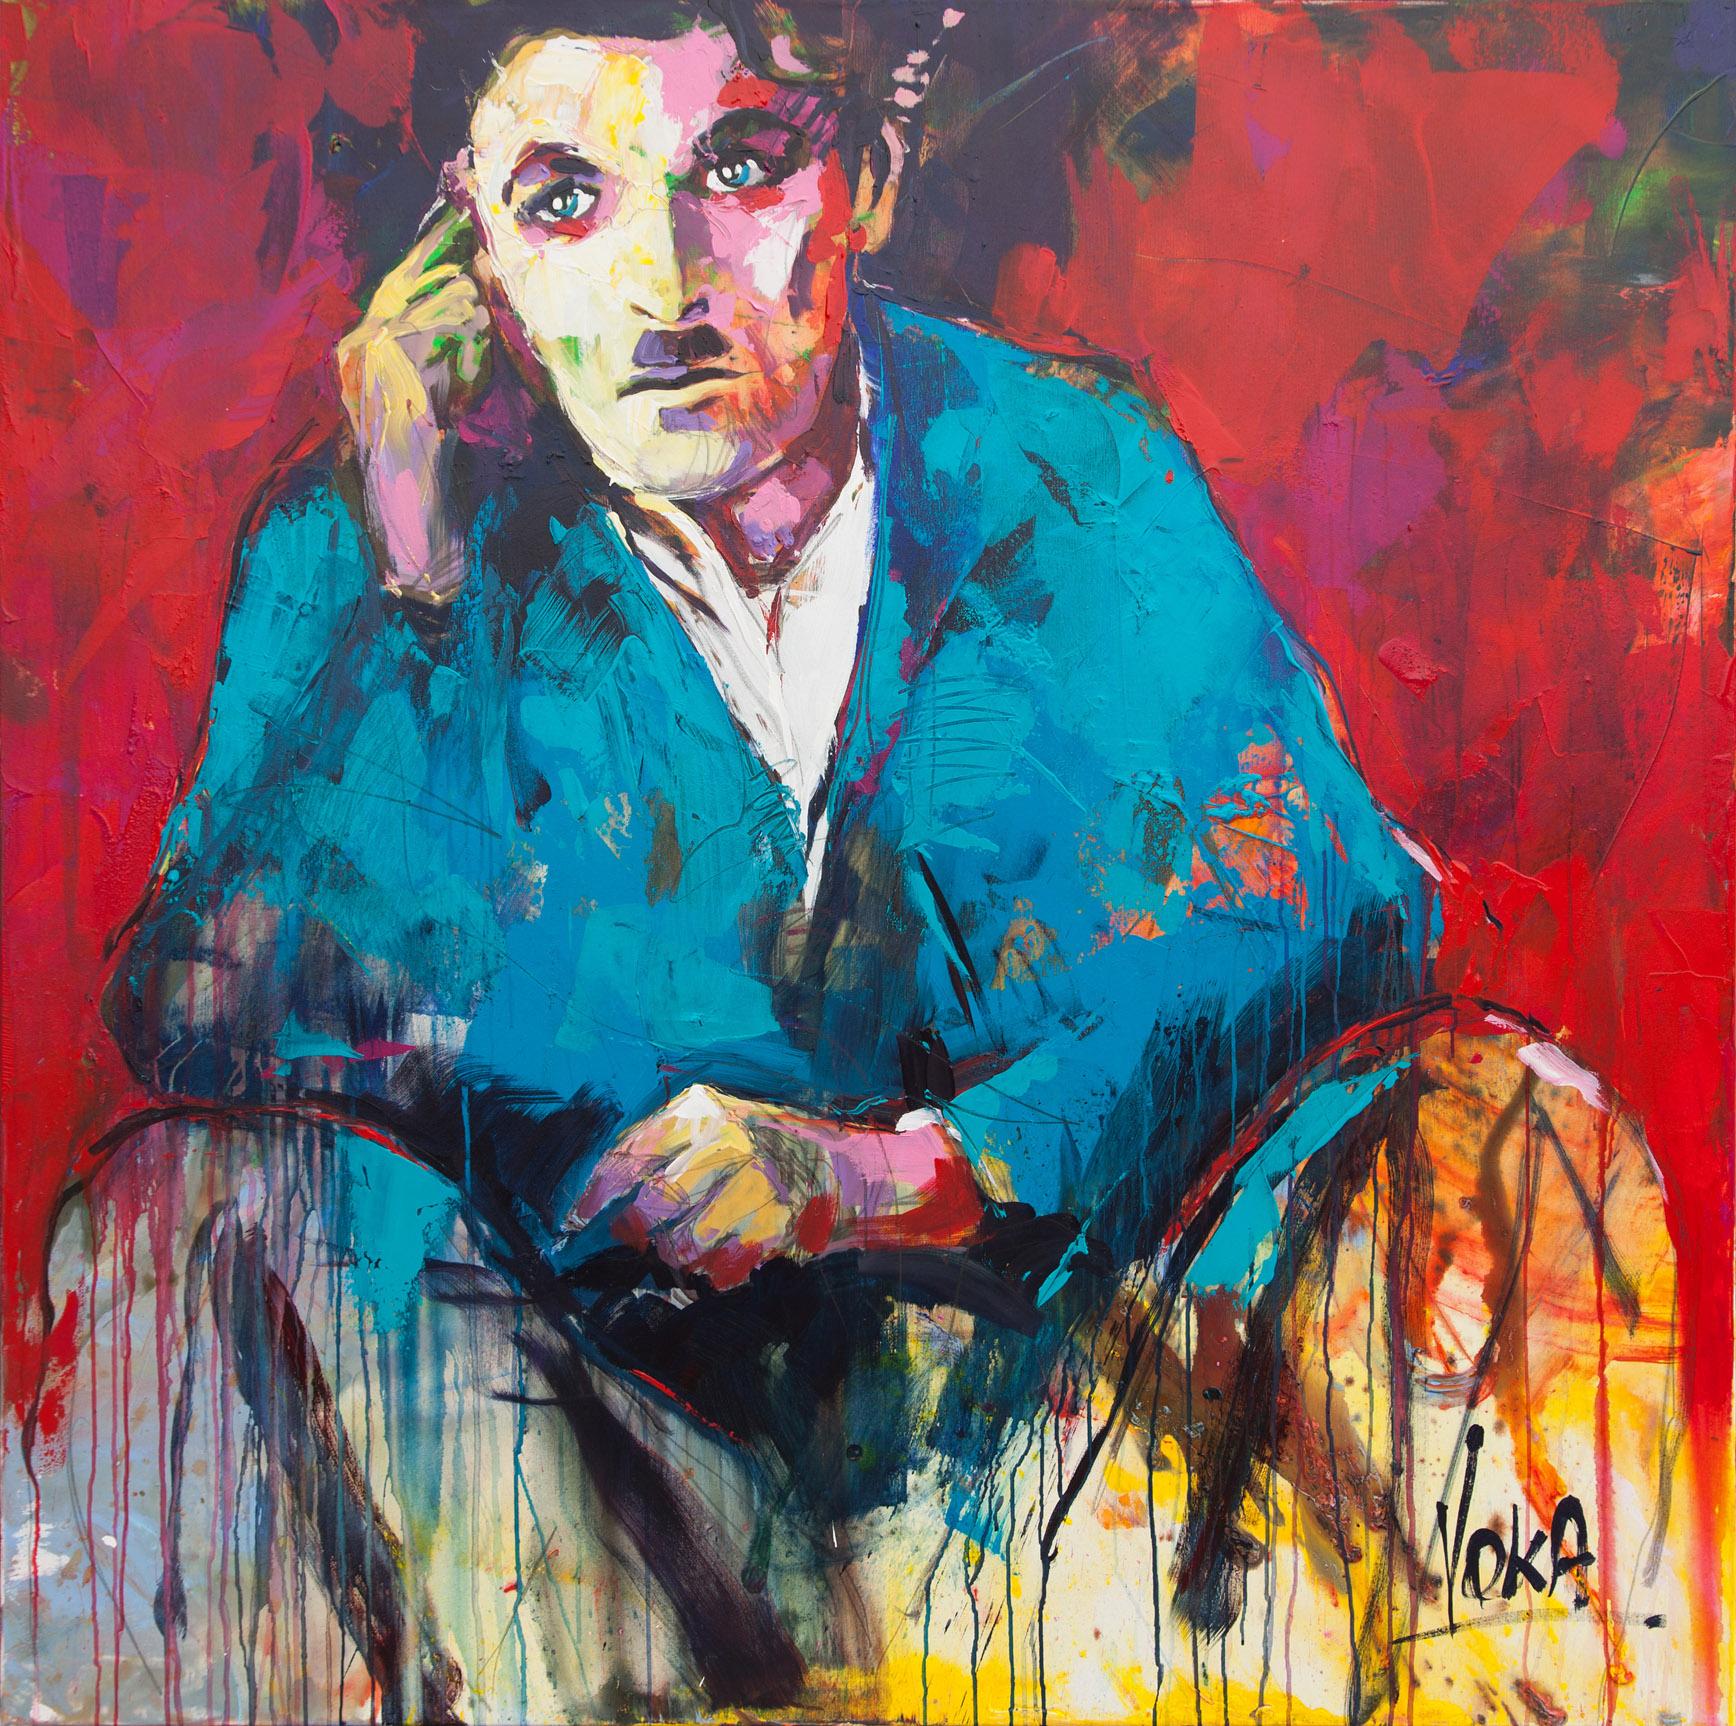 Charlie, 150x150 cm/59,1x59,1 inch, Acrylic on Canvas